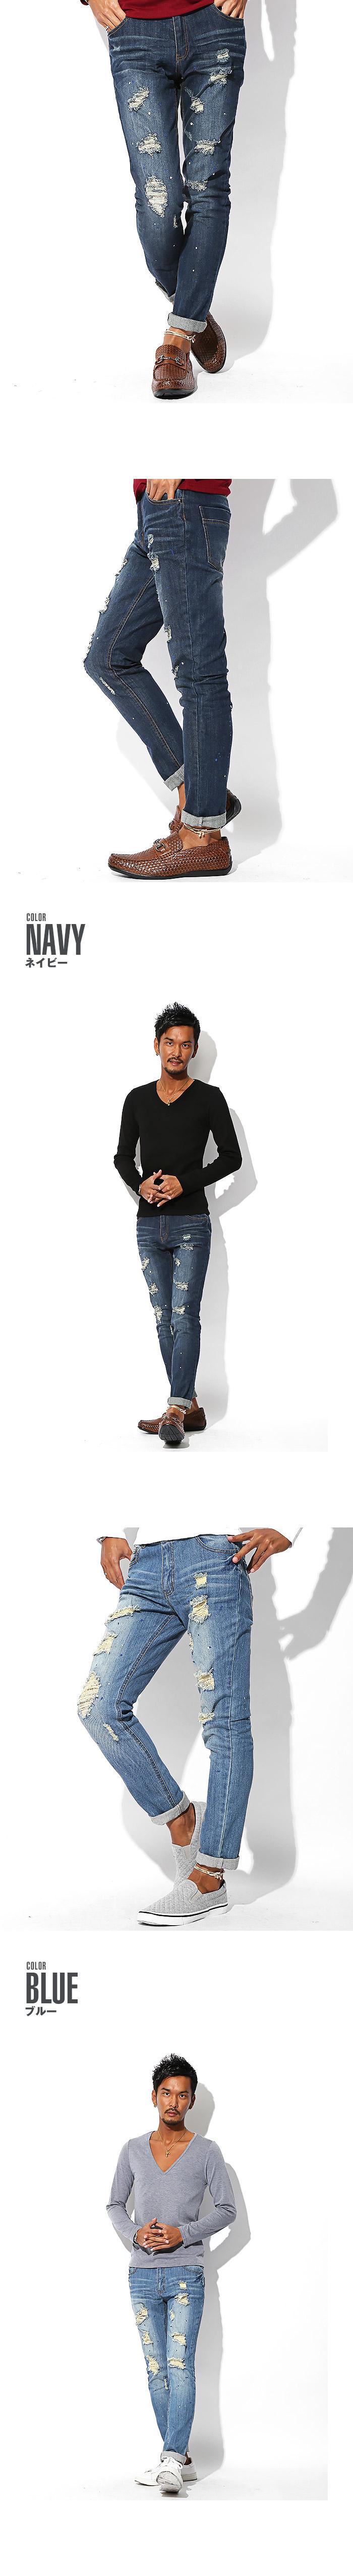 BITTER デニムパンツ メンズ ジーンズ スキニー ペンキ クラッシュ加工 ダメージ加工 スリム 細身 ペンキ ヴィンテージ ボトムス 下 ビター系 お兄系 カジュアル セレカジ セレブ サーフ 服 ファッション カラー